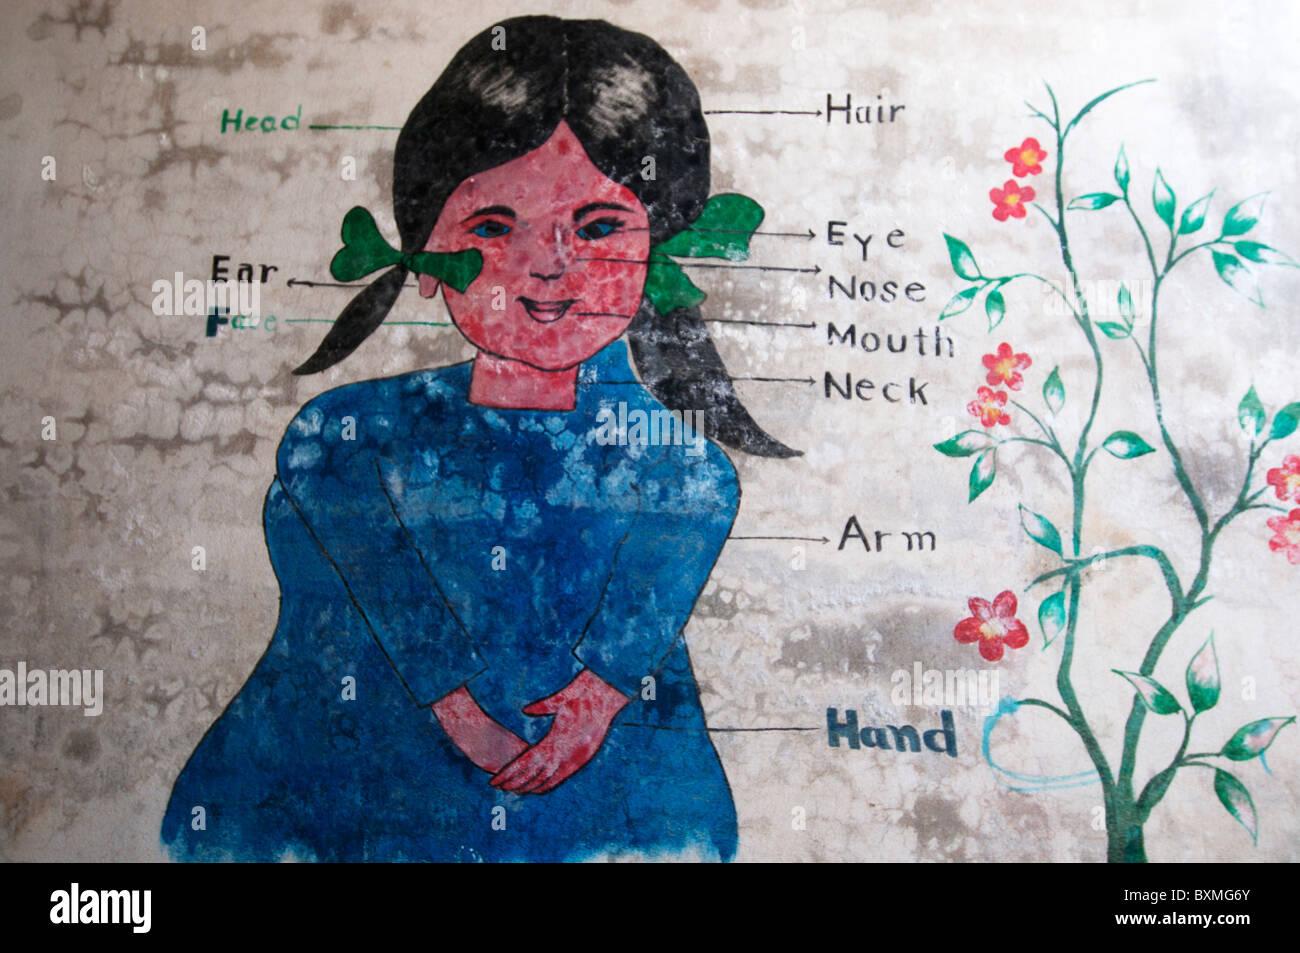 Pakistan .Al Haq Public School. 230 pupils, 9 teachers.Wall painting of girl showing parts of the body, flood damaged. - Stock Image